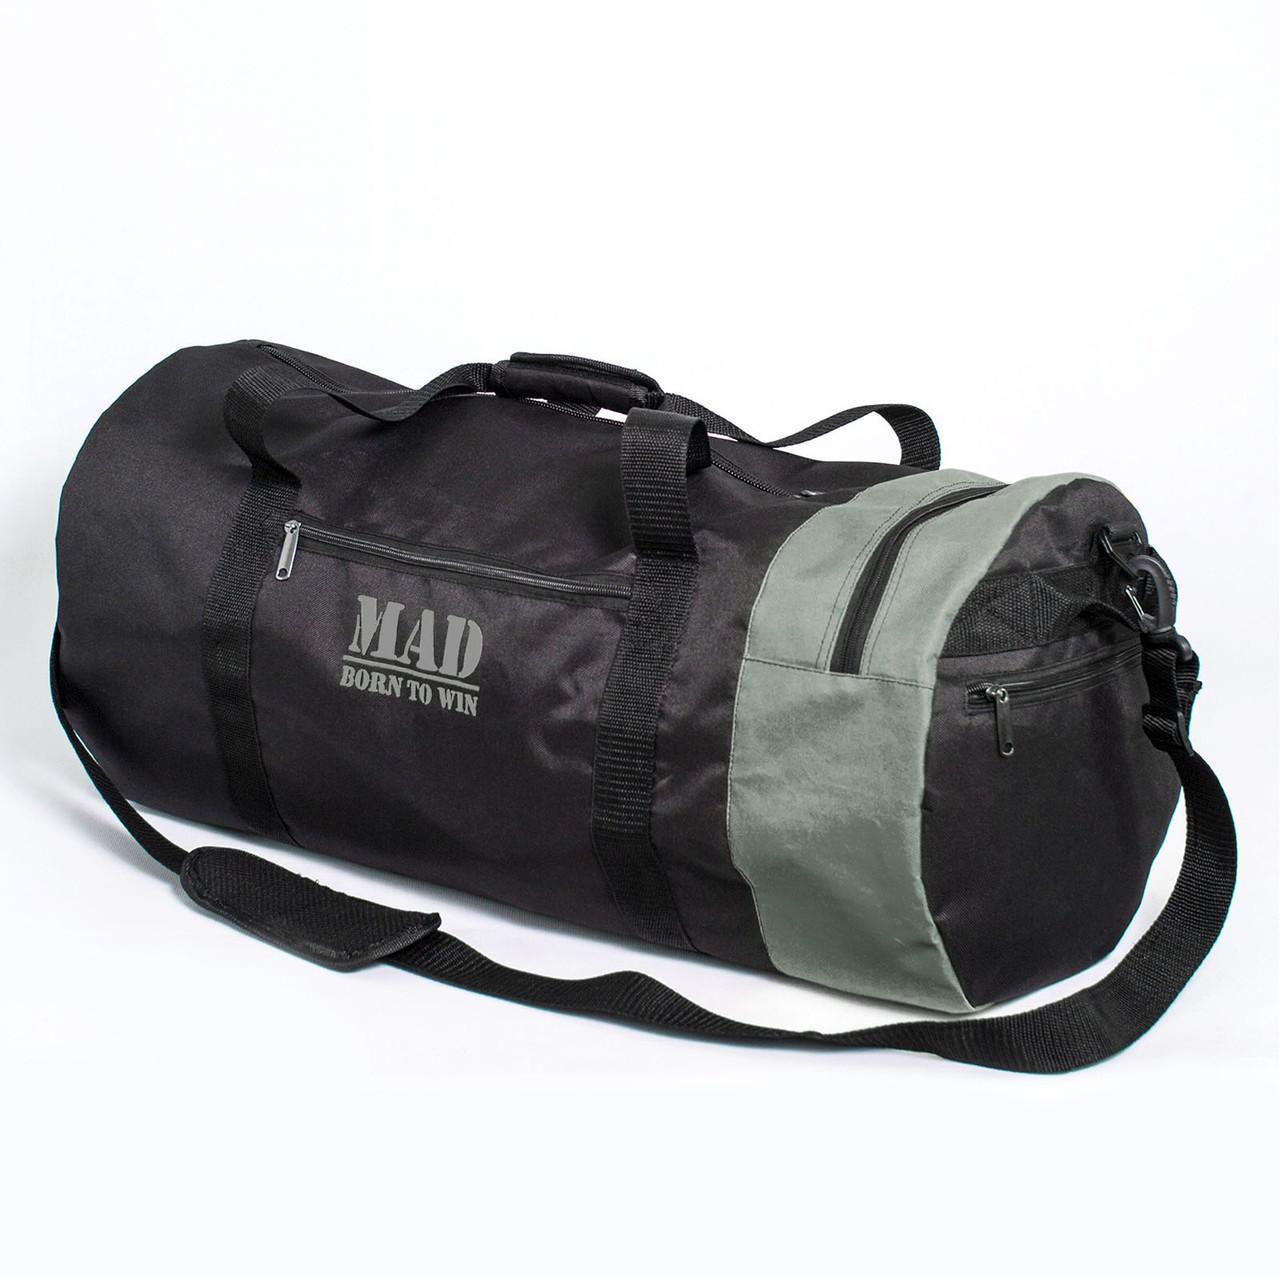 504b1394ad1e2 Большая спортивная сумка–тубус XXL 50L черно-серая от MAD   born to win™,  цена 693 грн., купить в Запорожье — Prom.ua (ID#1005767557)